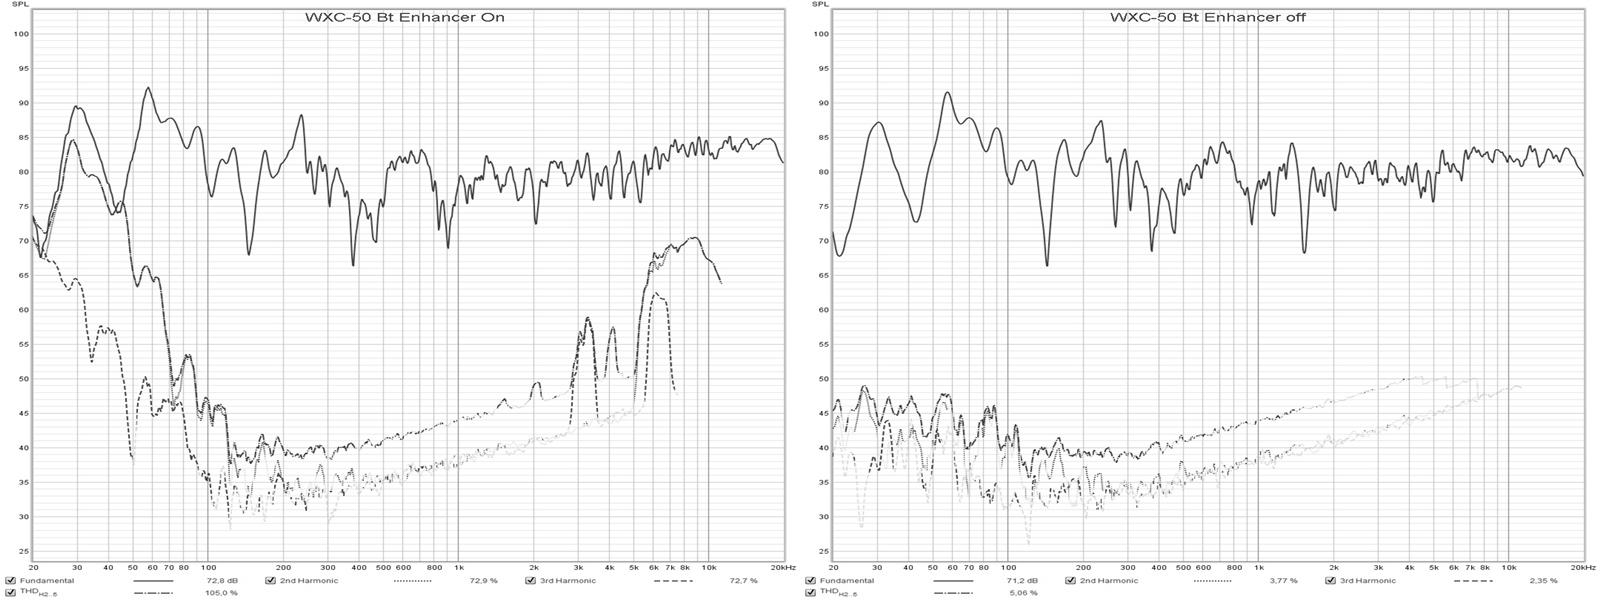 WXC-50 Enhancer on vs off distortion.jpg